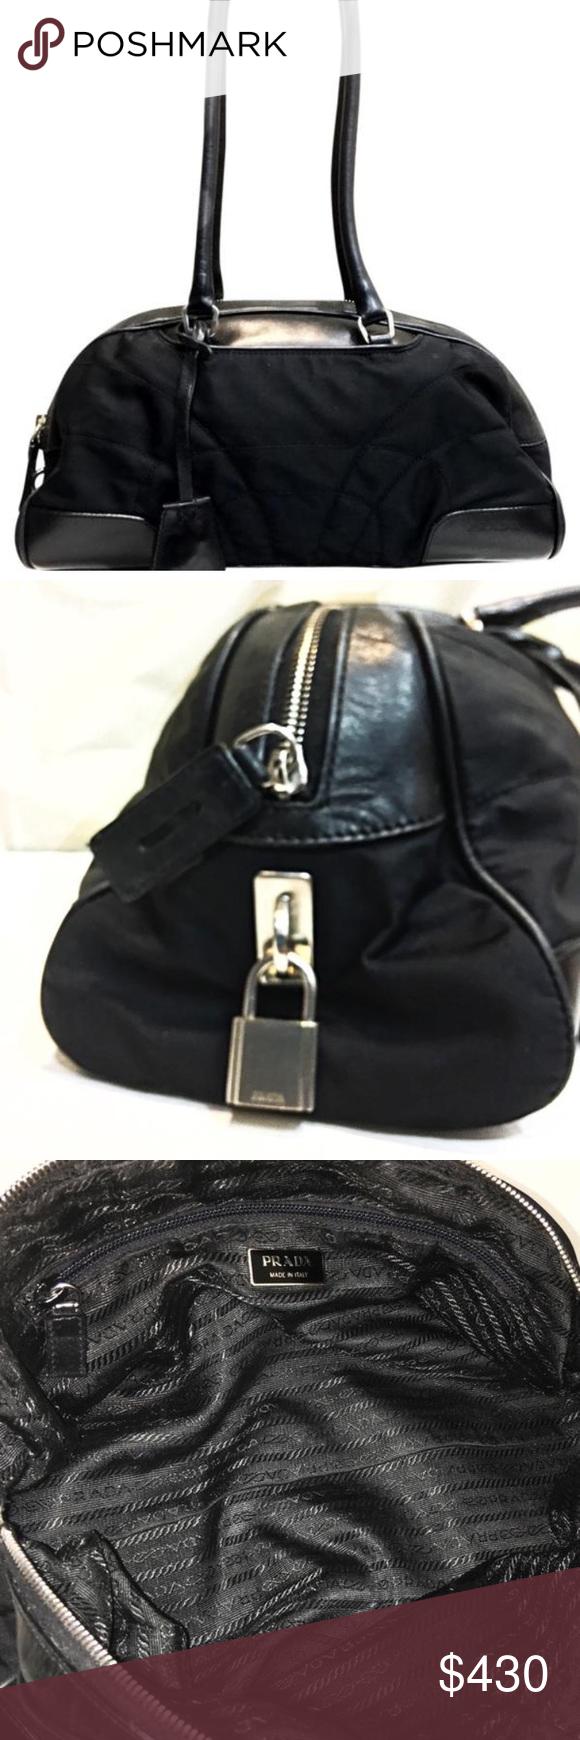 397430e2f3cd Long handle Prada bowler shoulder tote satchel Famous iconic bowling bowler  bag by Prada. Well